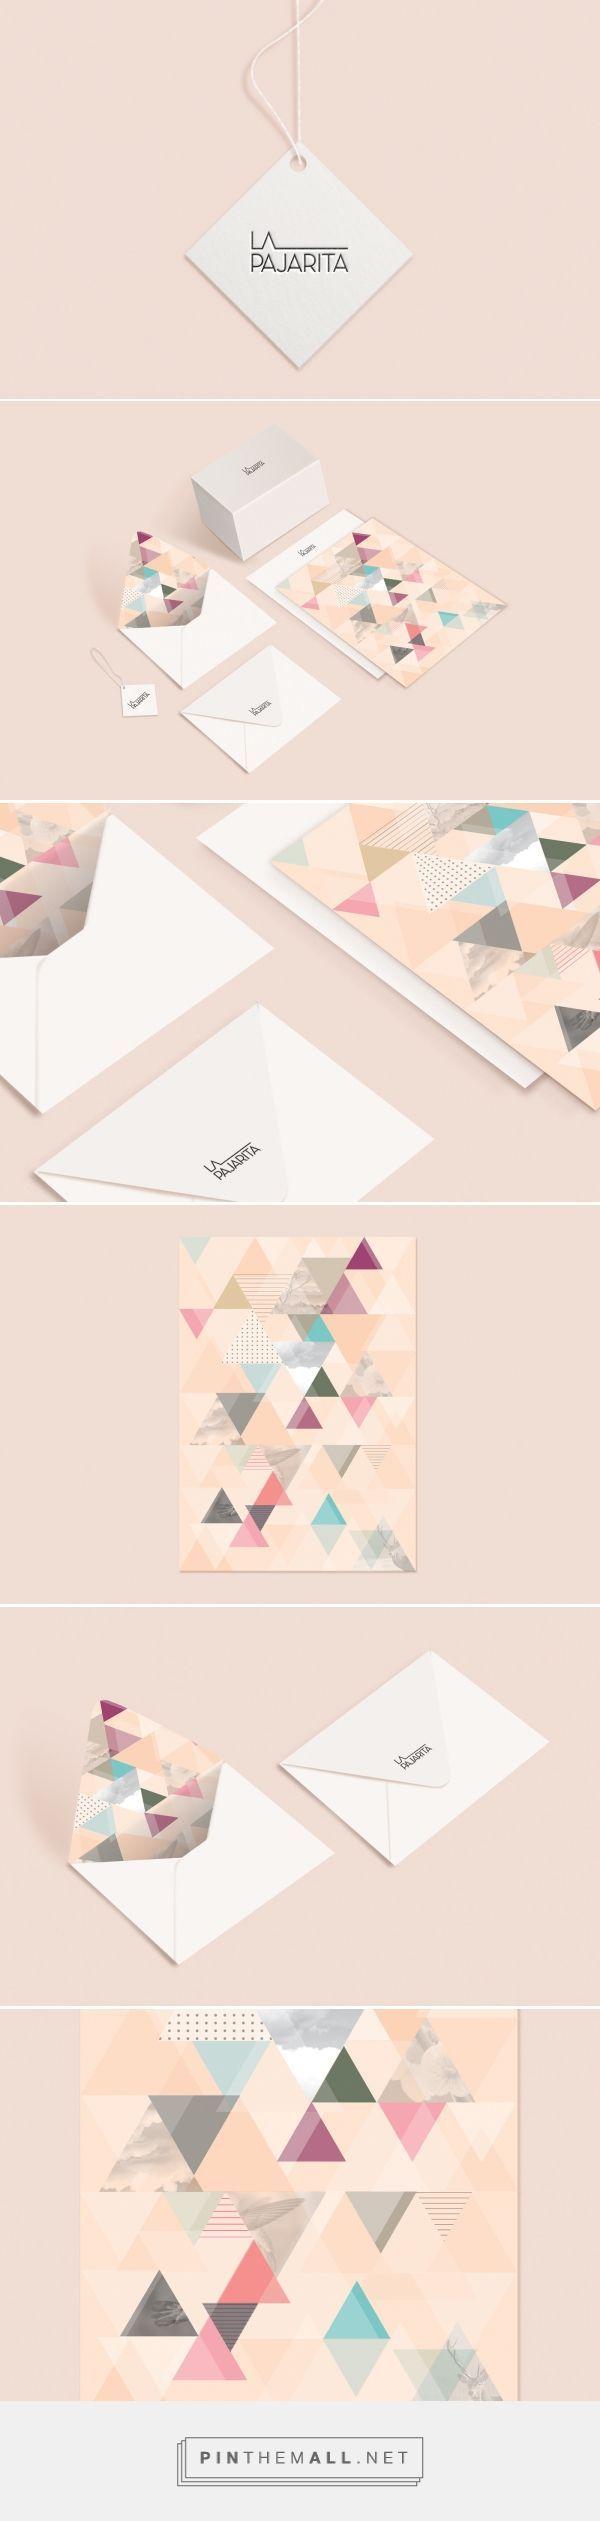 La Pajarita Branding by Maria Hdez on Behance | Fivestar Branding – Design and Branding Agency & Inspiration Gallery fivestarlogo.com/